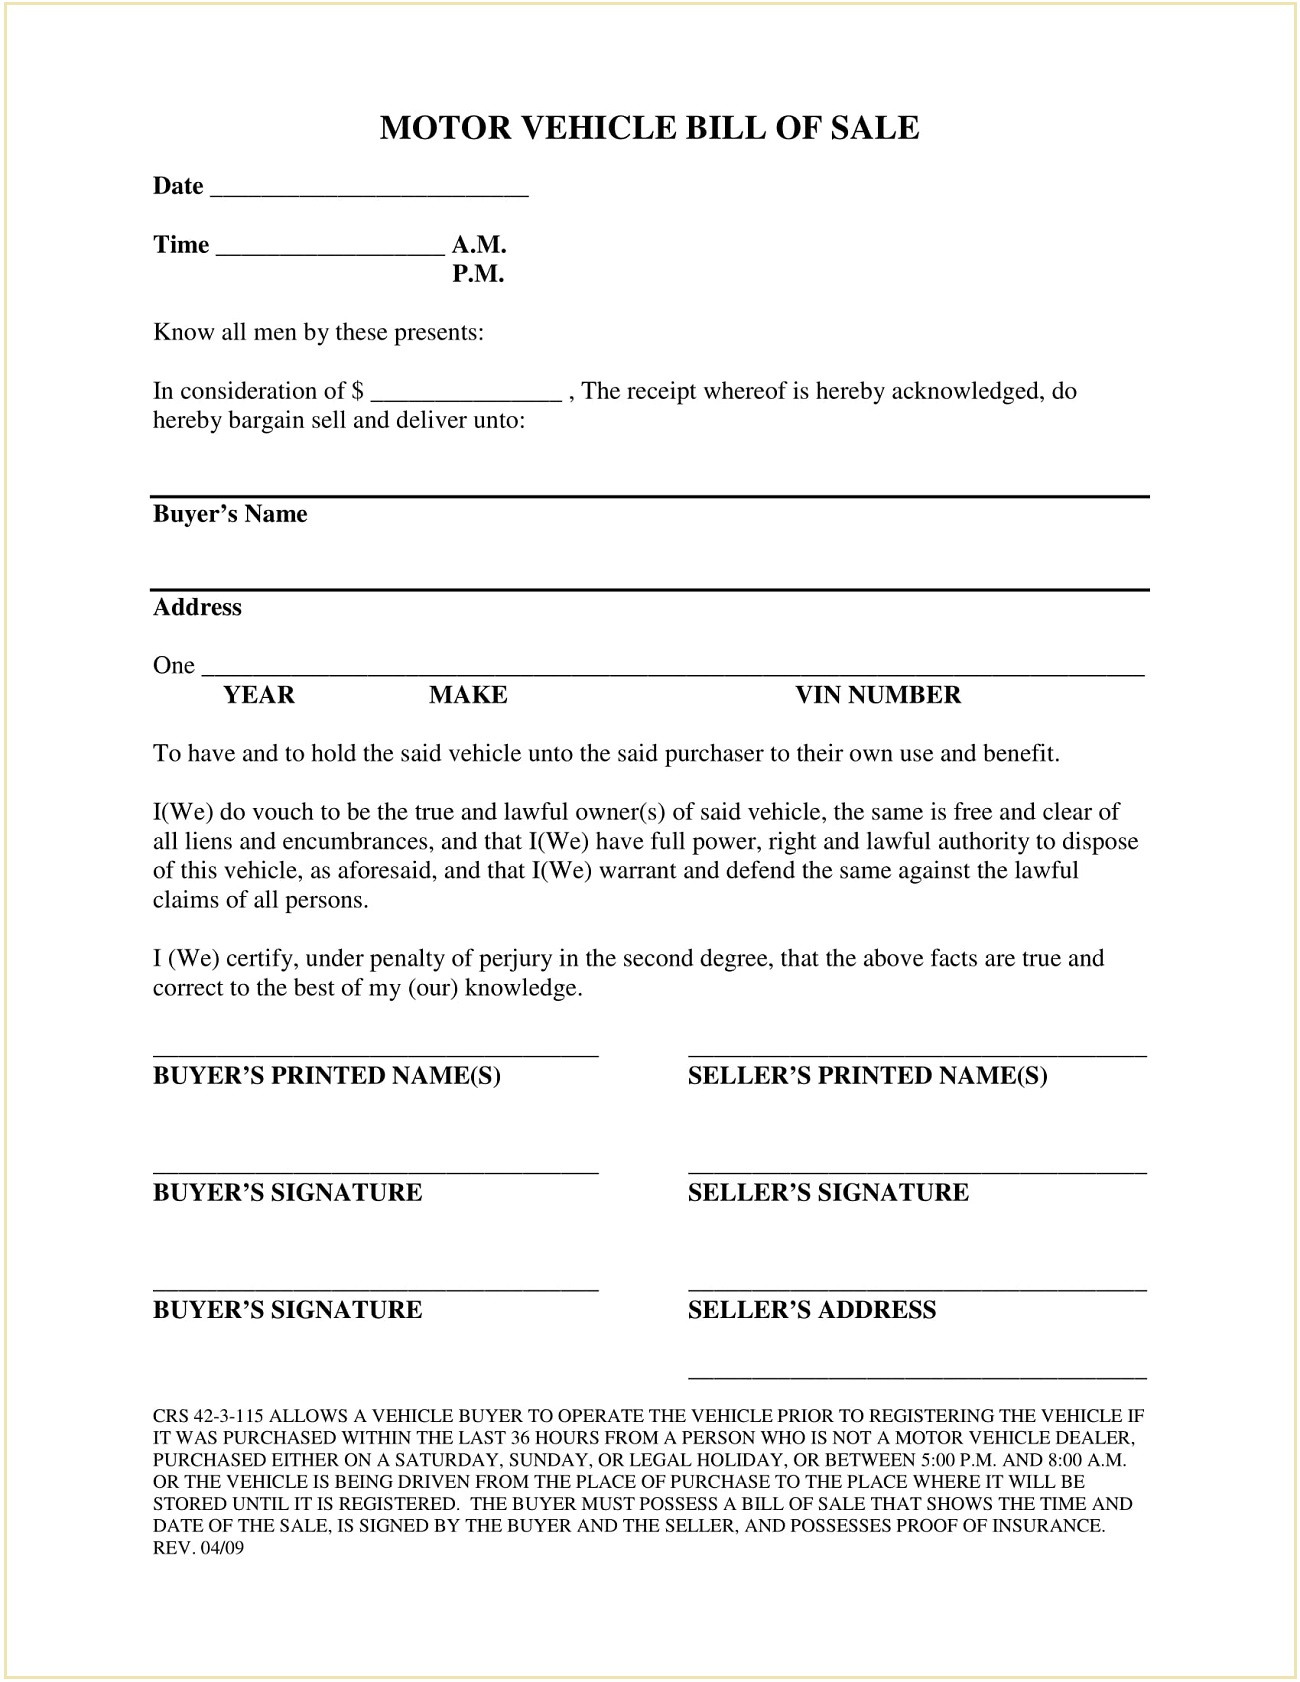 Jefferson County Colorado DMV Motor Vehicle Bill of Sale Form PDF